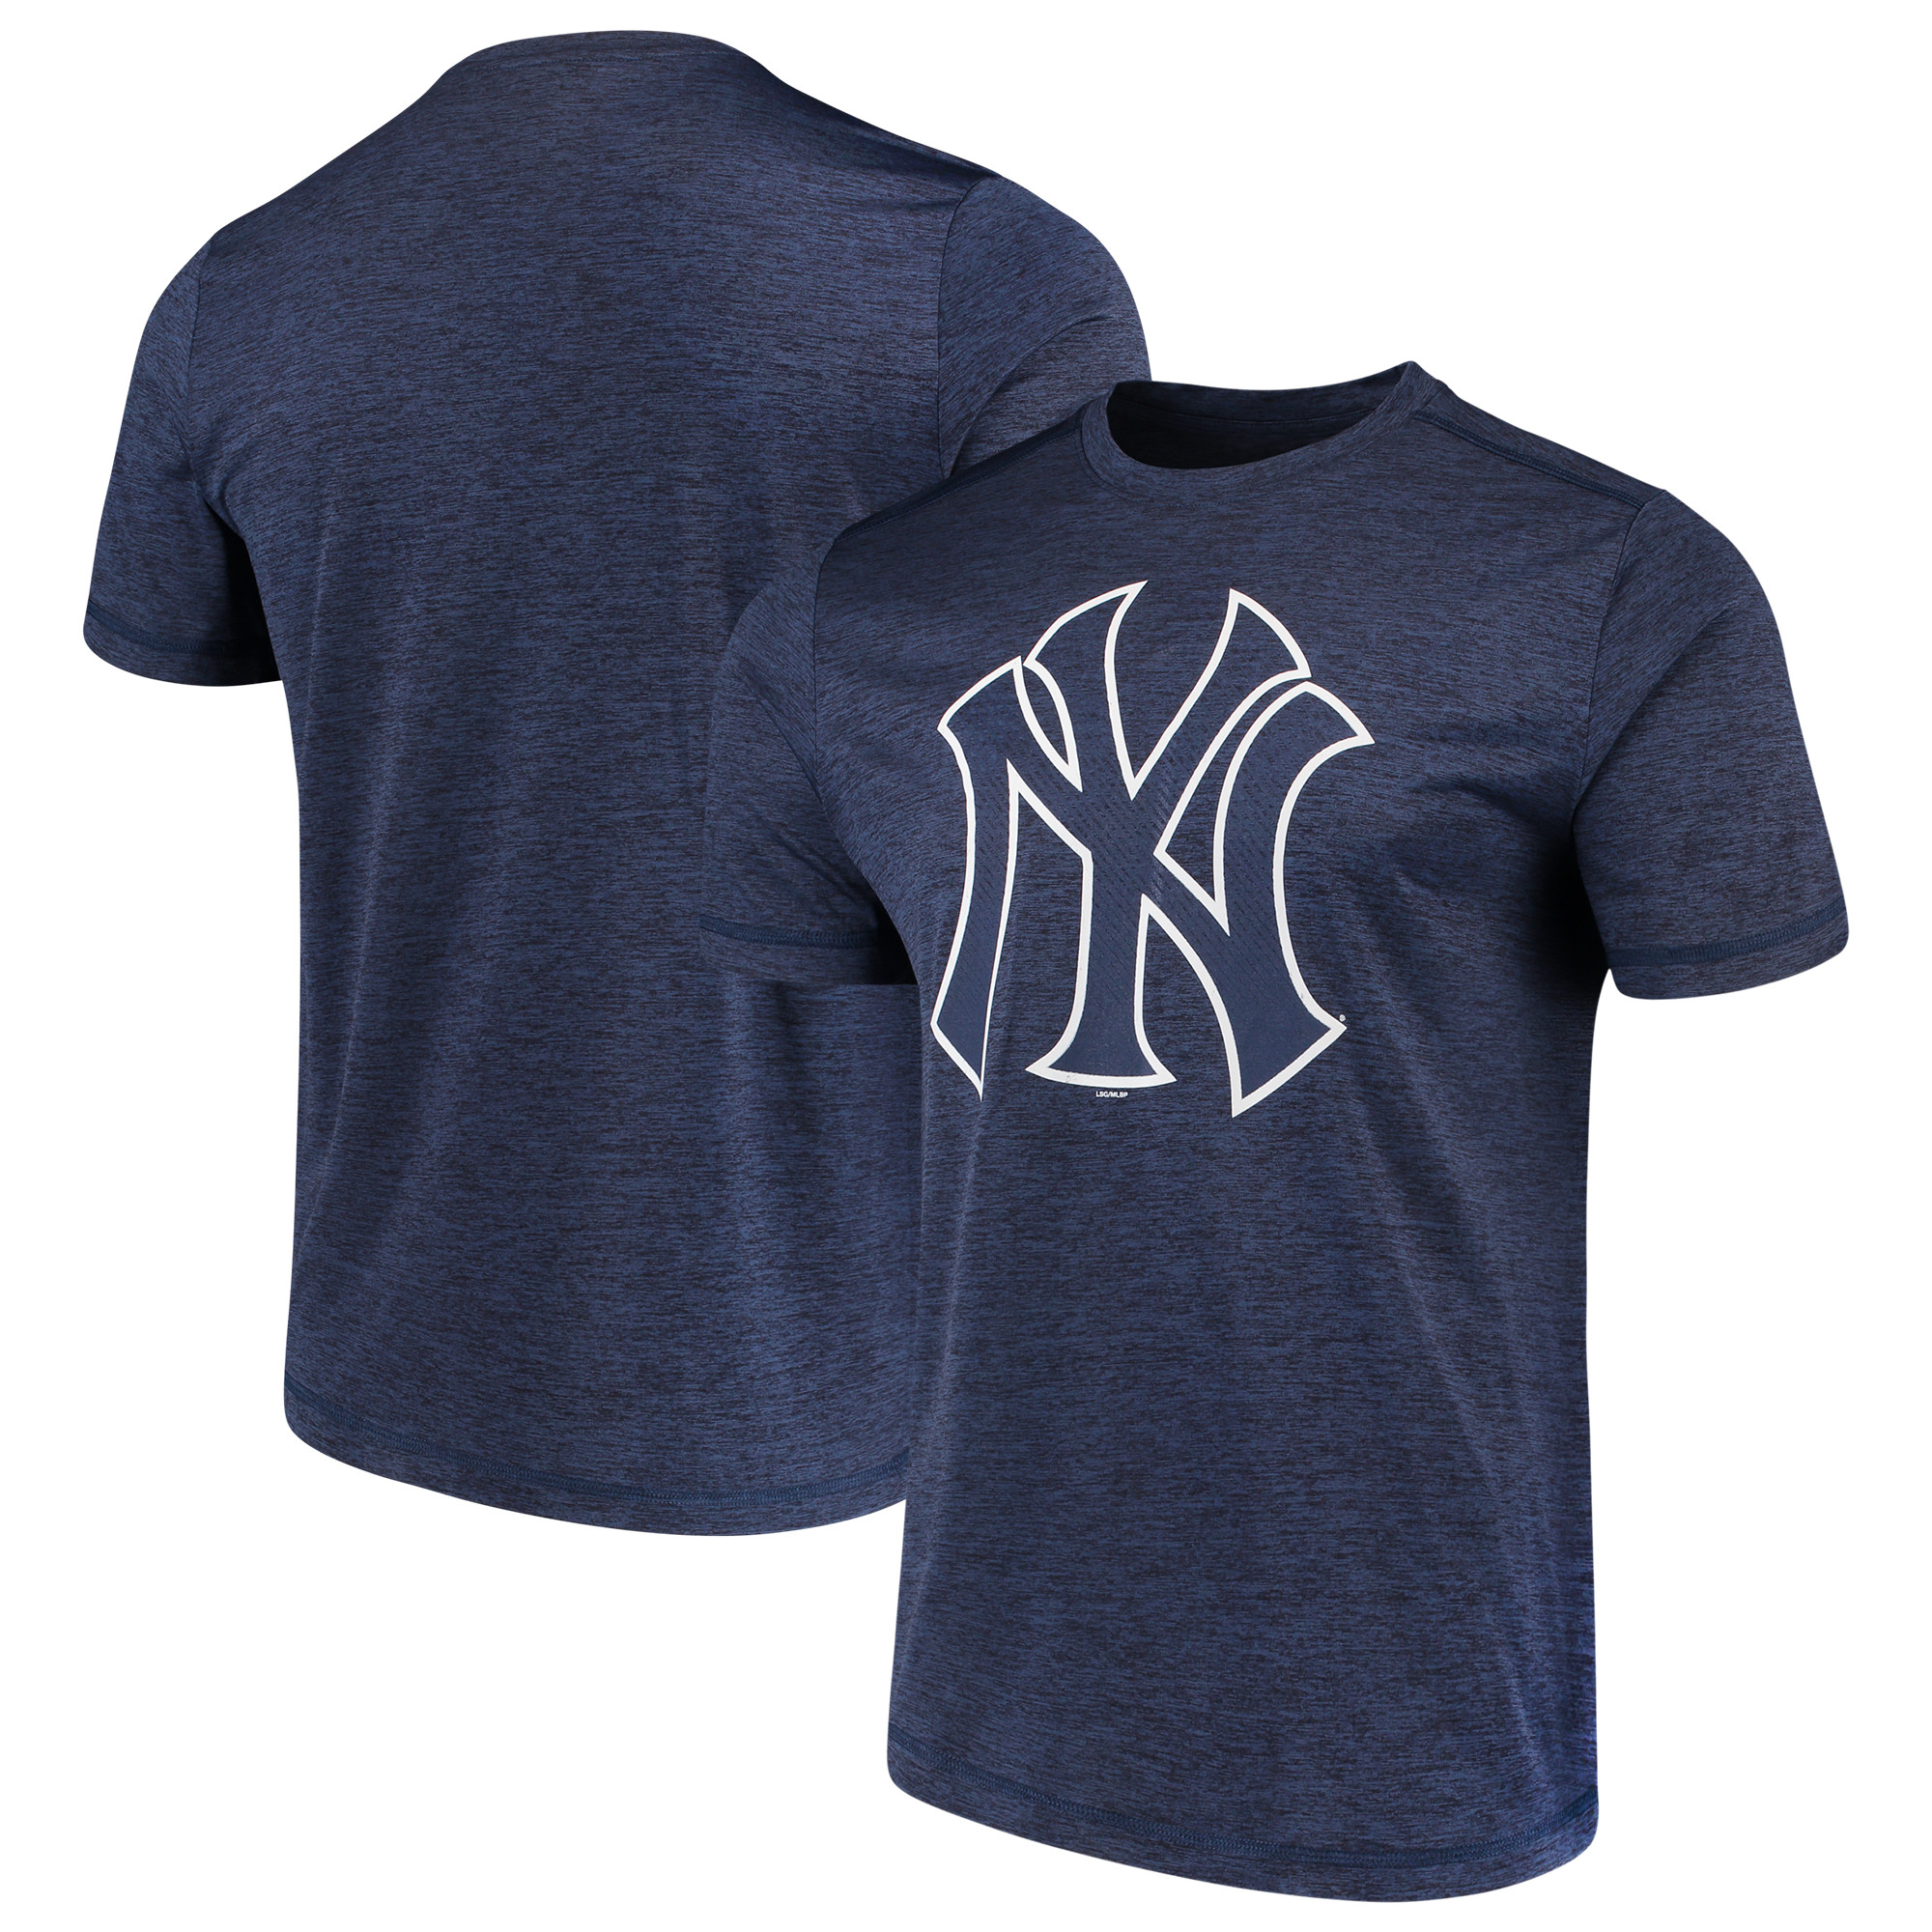 Men's Majestic Heathered Navy New York Yankees Logo Statement T-Shirt